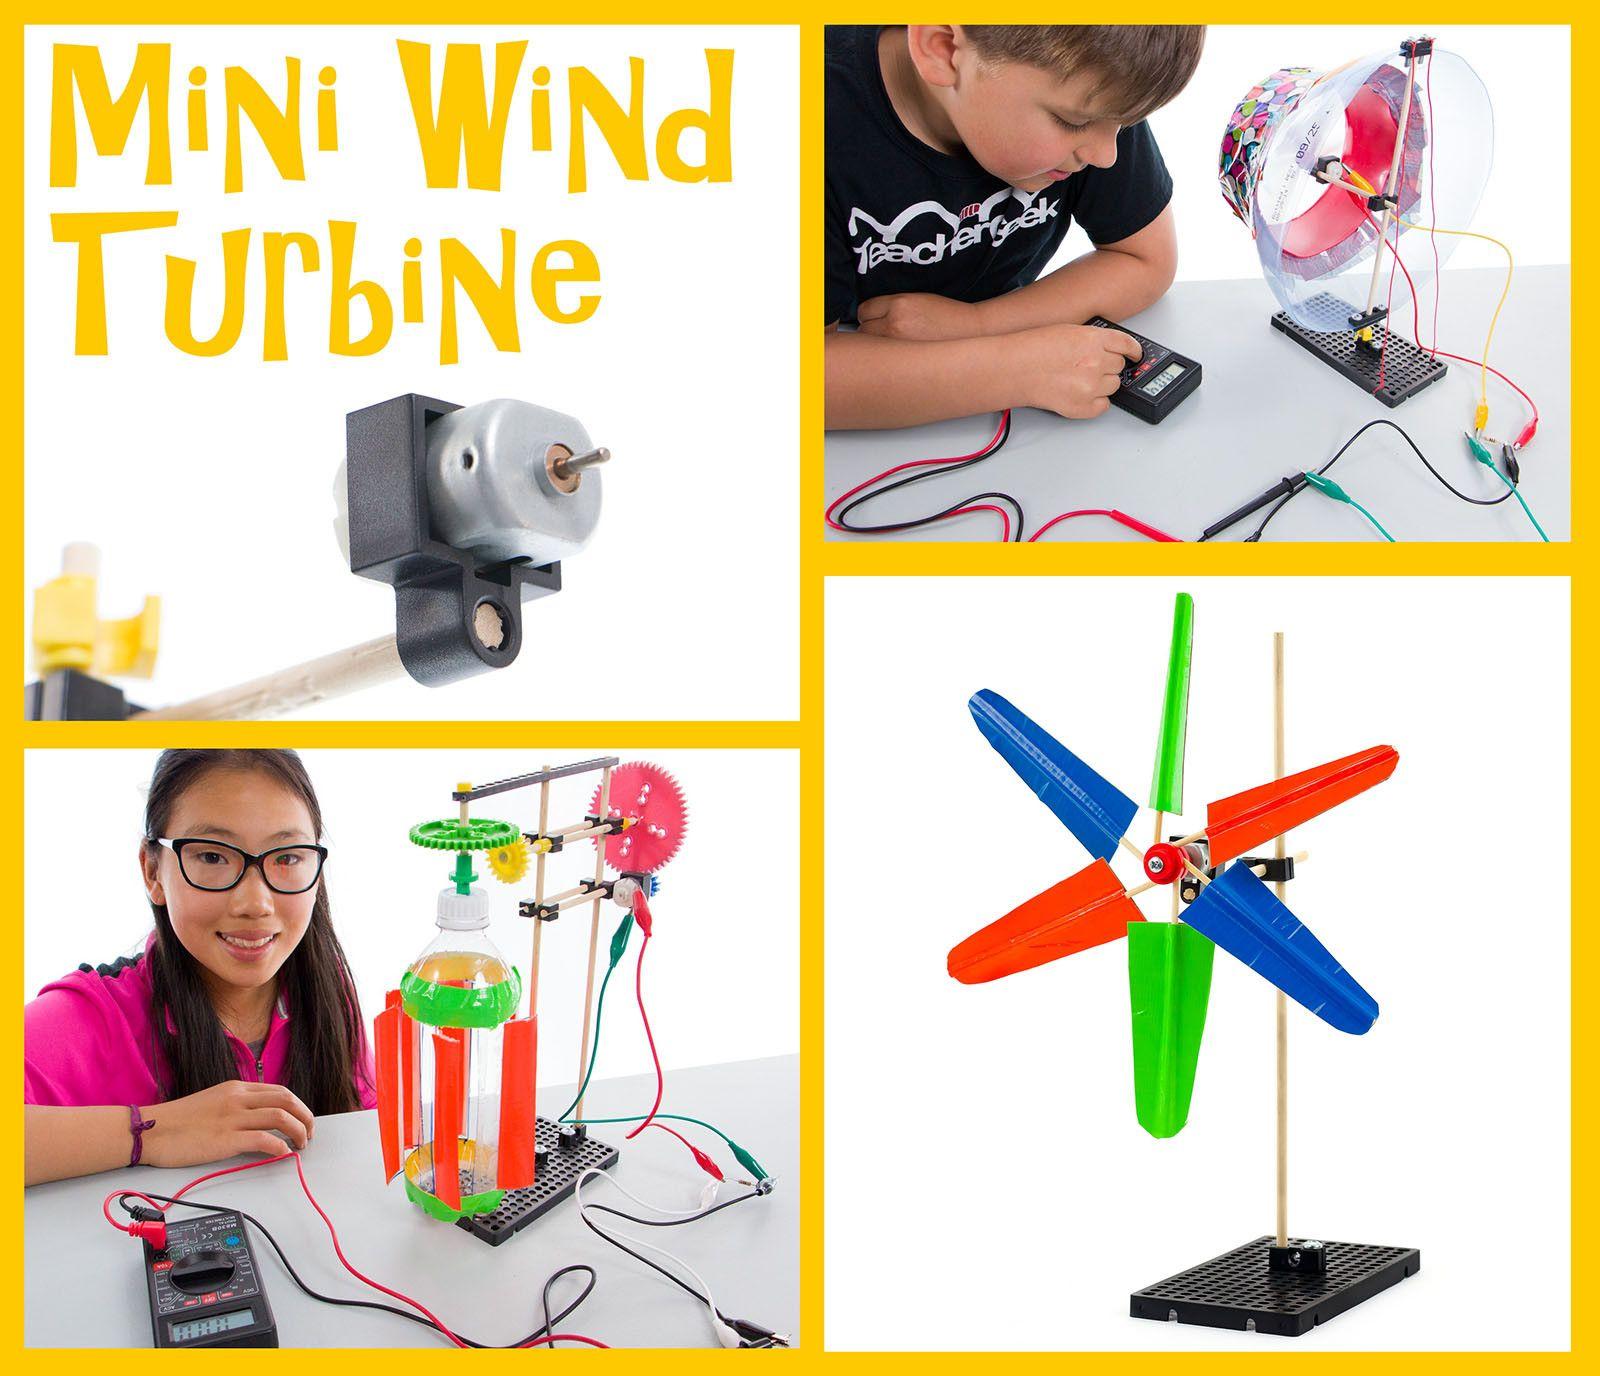 Mini Wind Turbine Activity Documents | Middle School STEM | STEAM